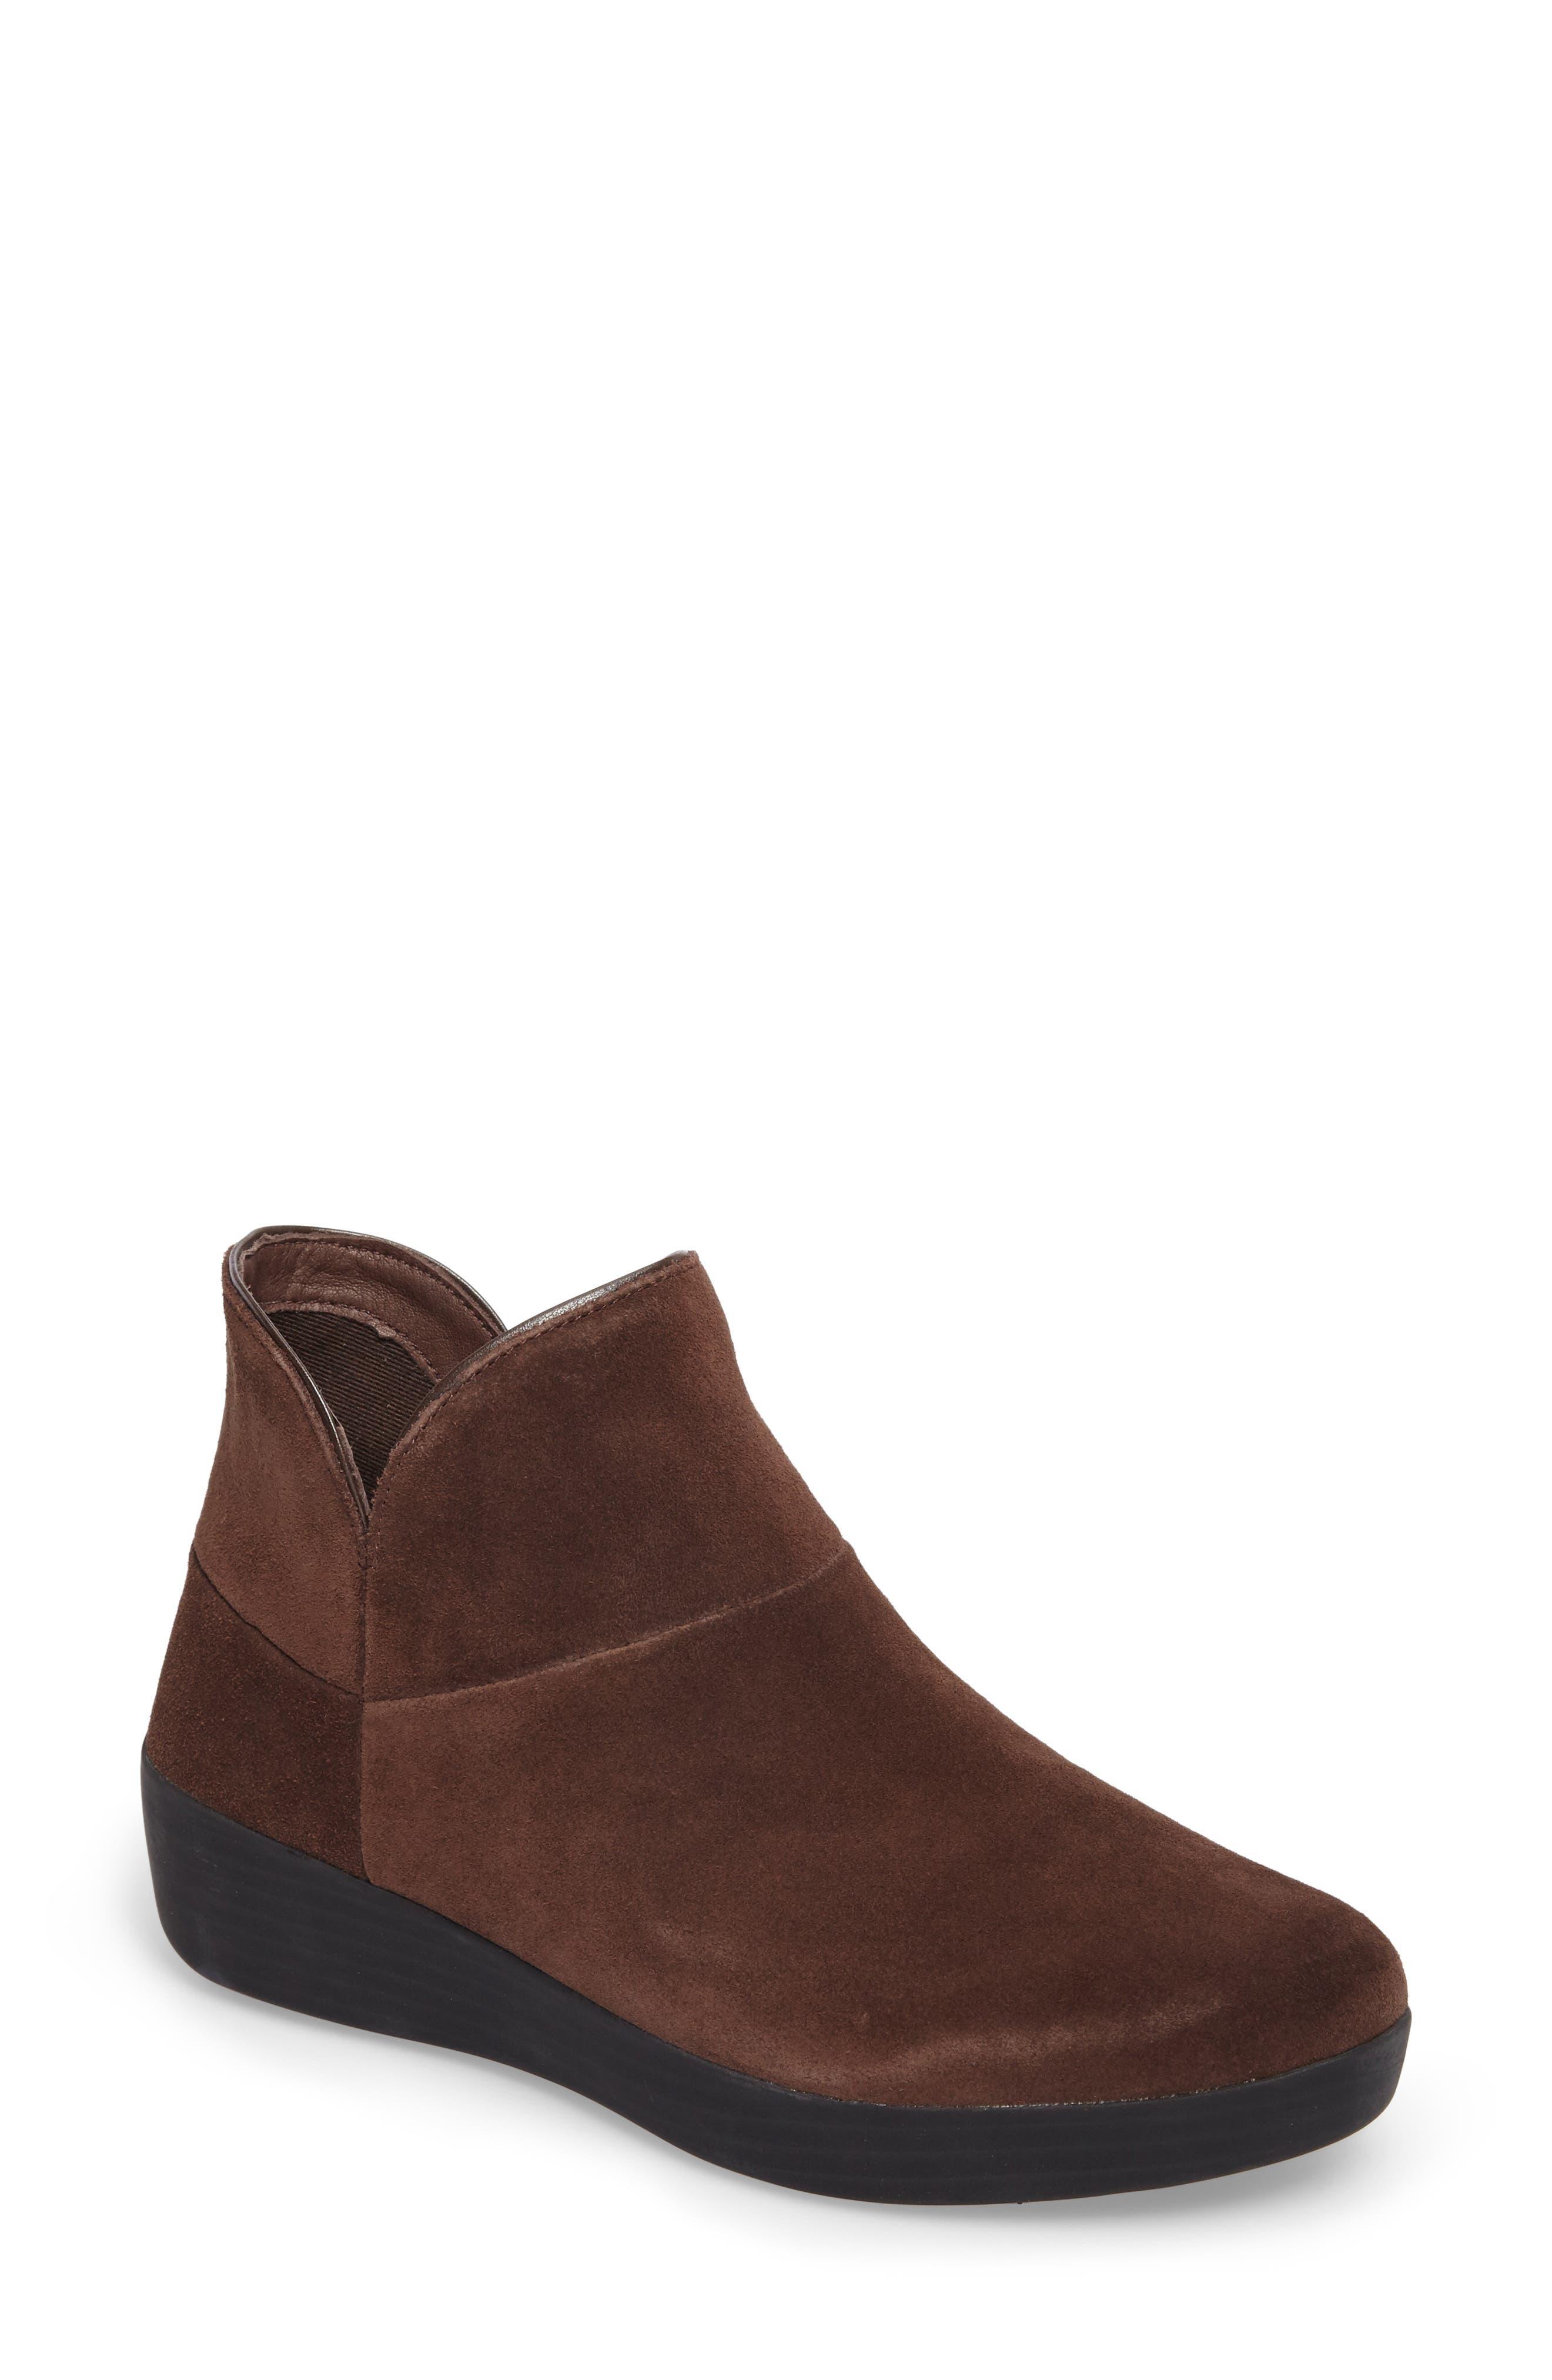 Supermod Ankle Boot,                         Main,                         color, 201